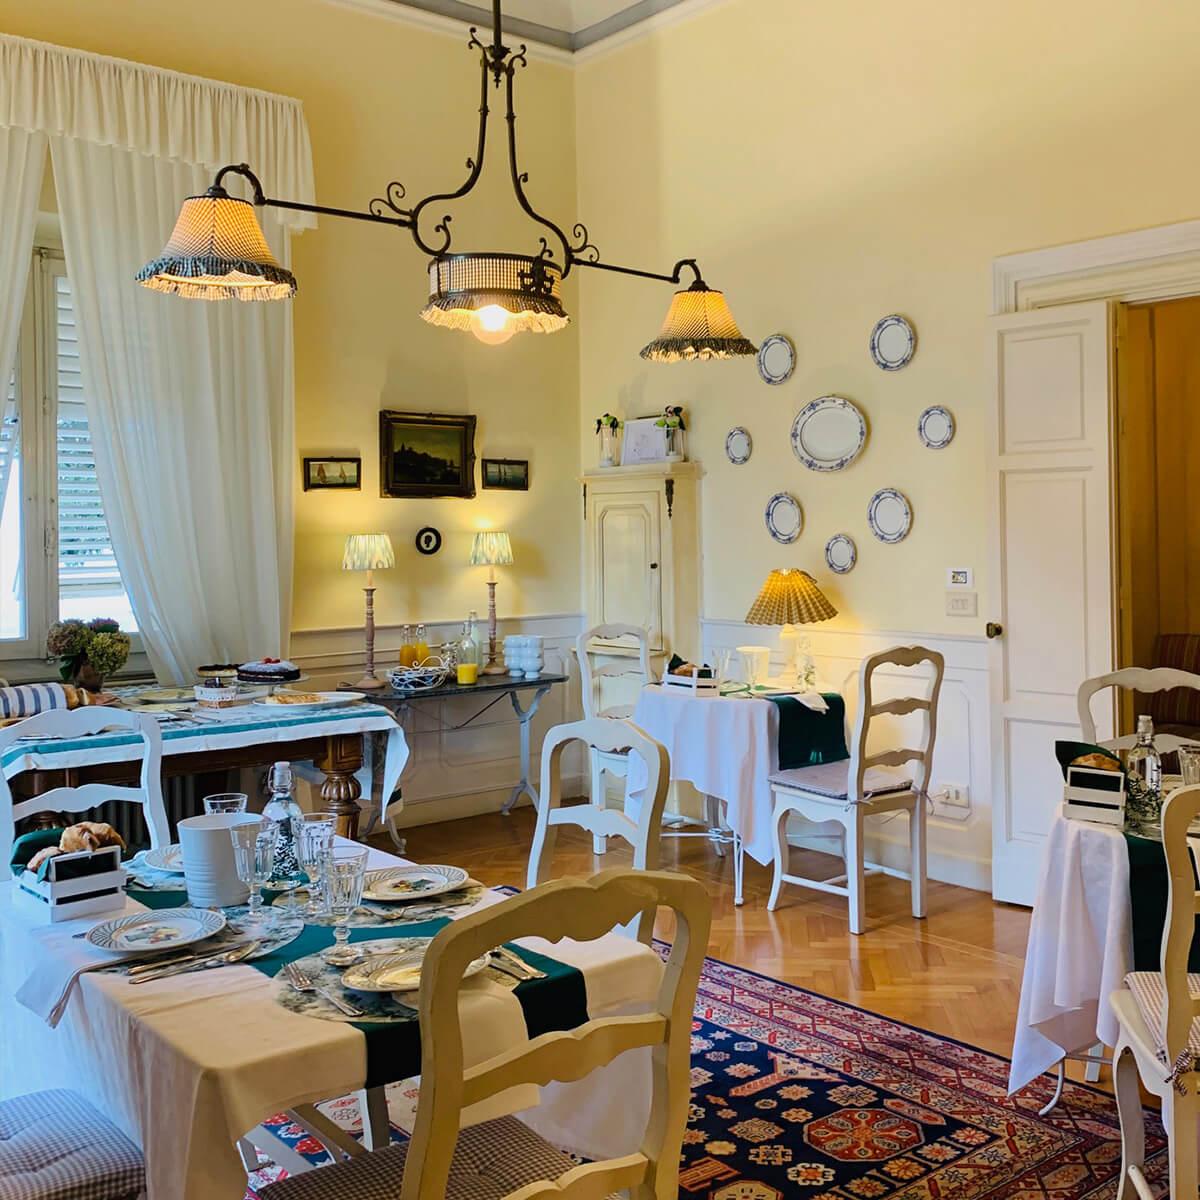 Villa la Moresca Relais de Charme B&B